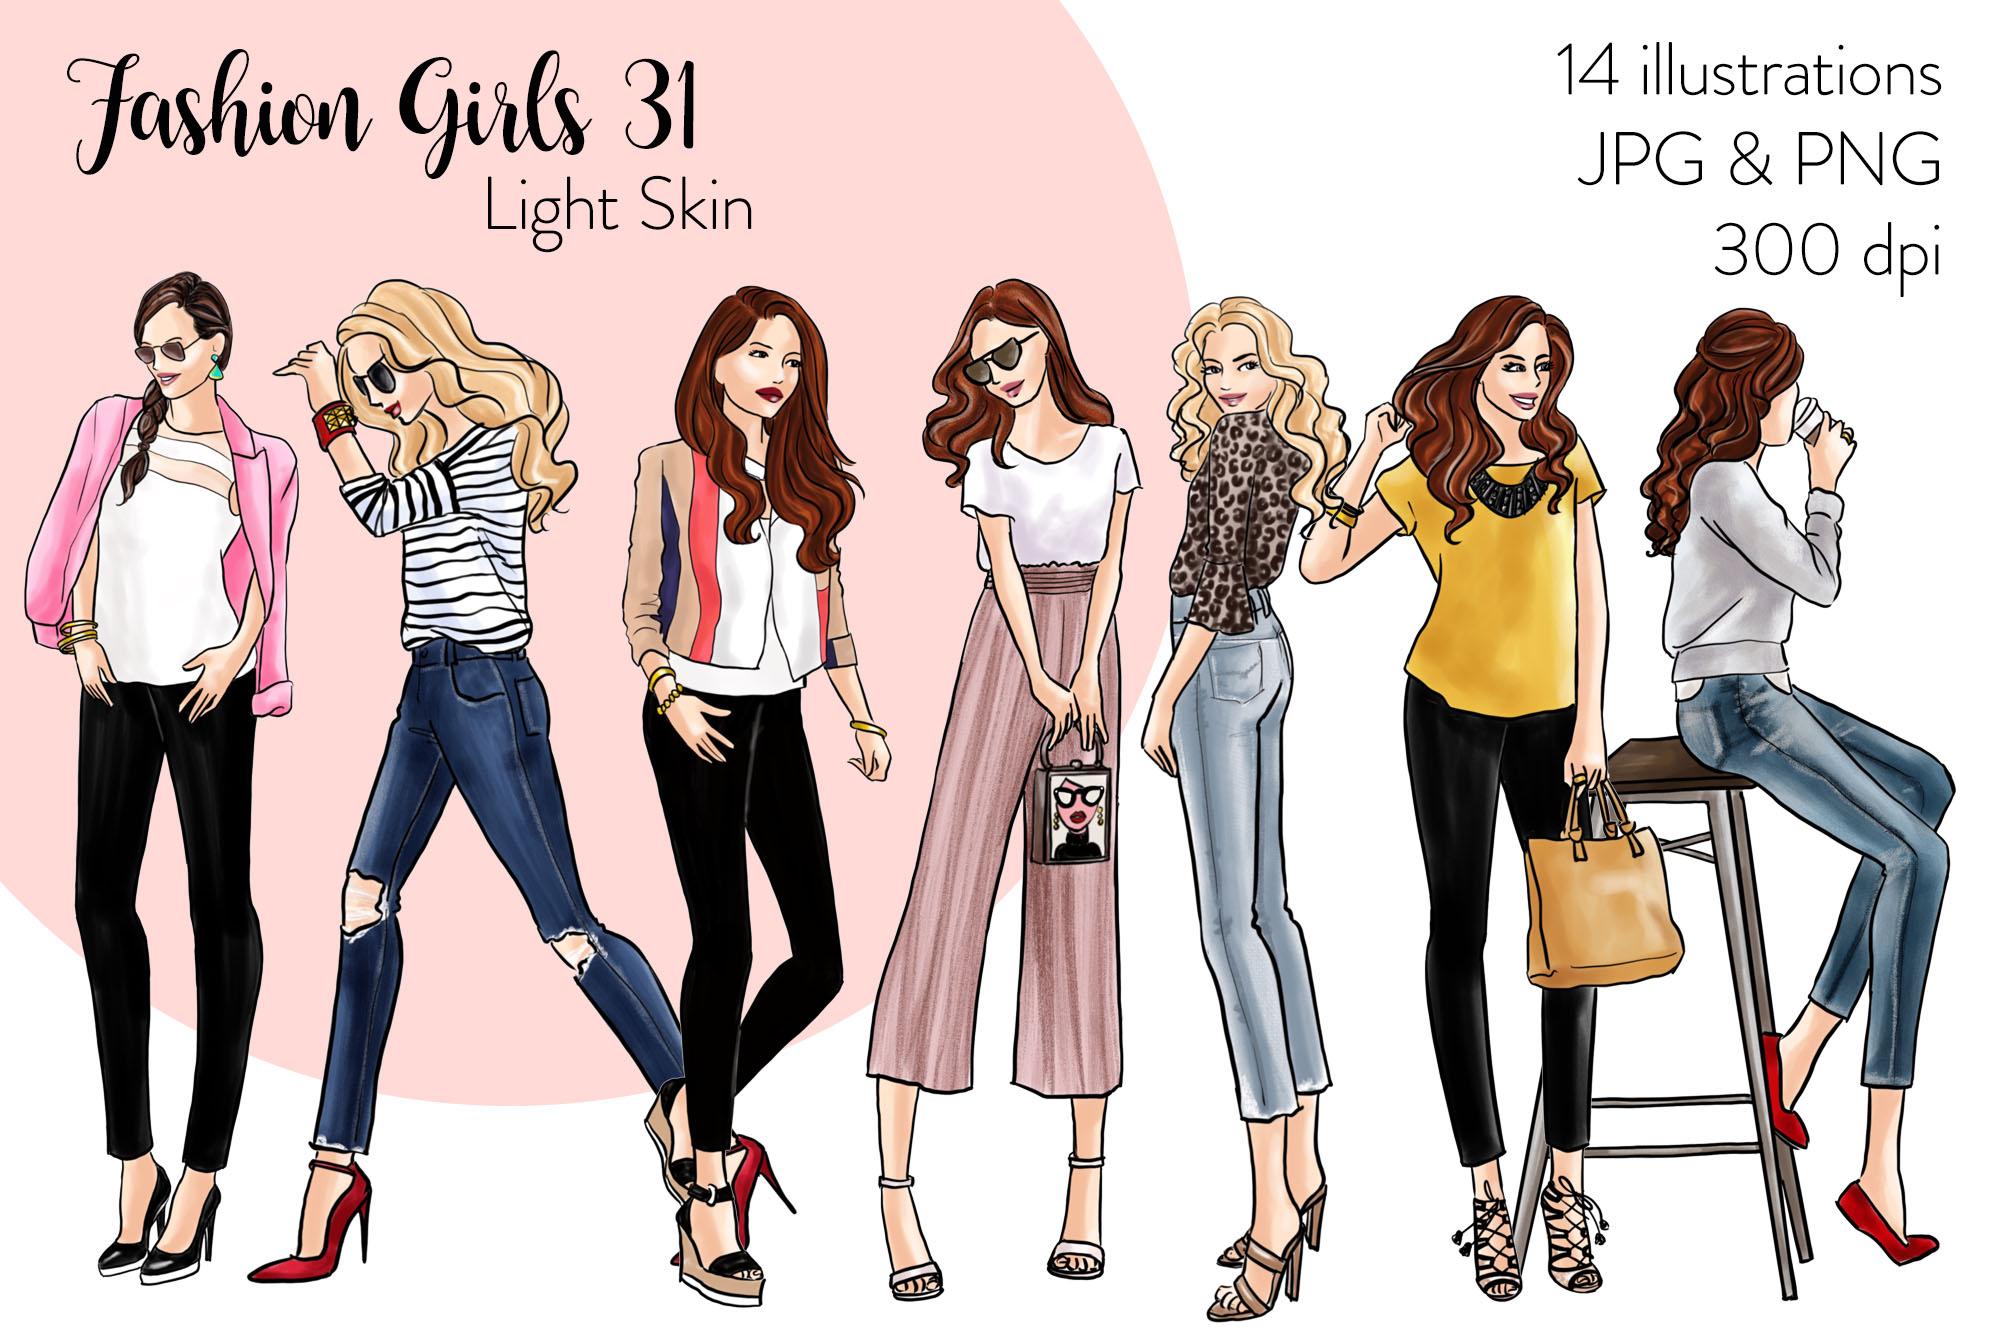 Fashion illustration clipart - Fashion Girls 31 - Light Skin example image 1